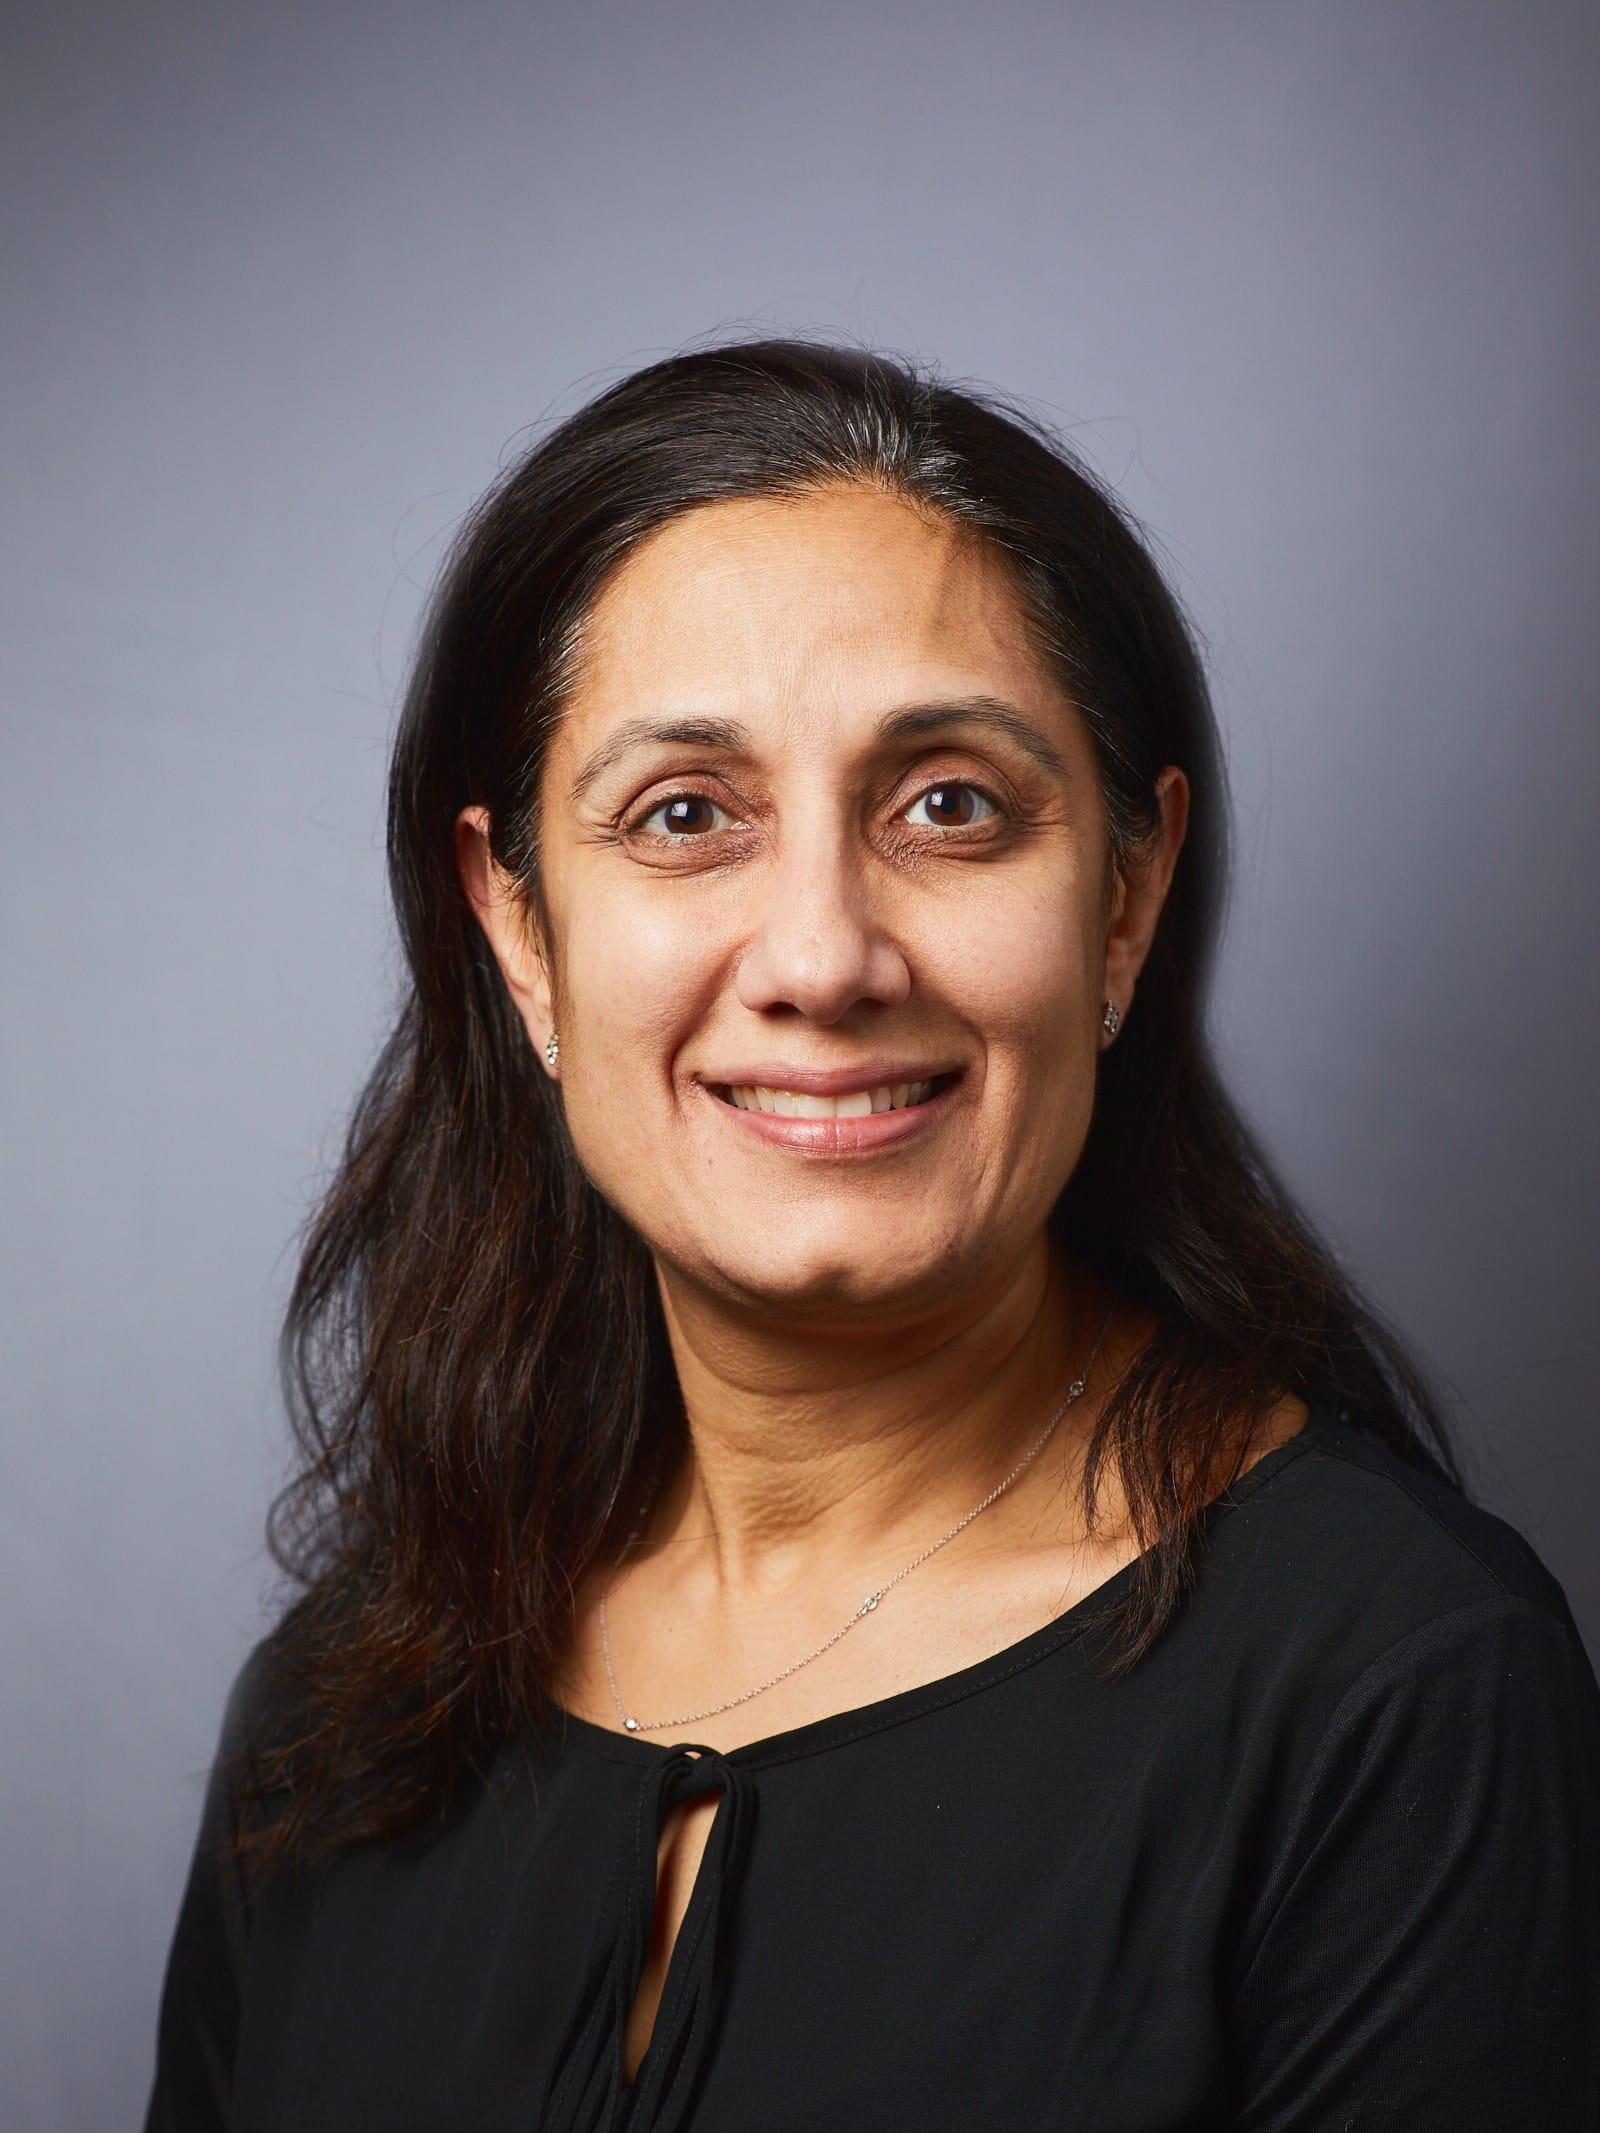 Shefali Pathy